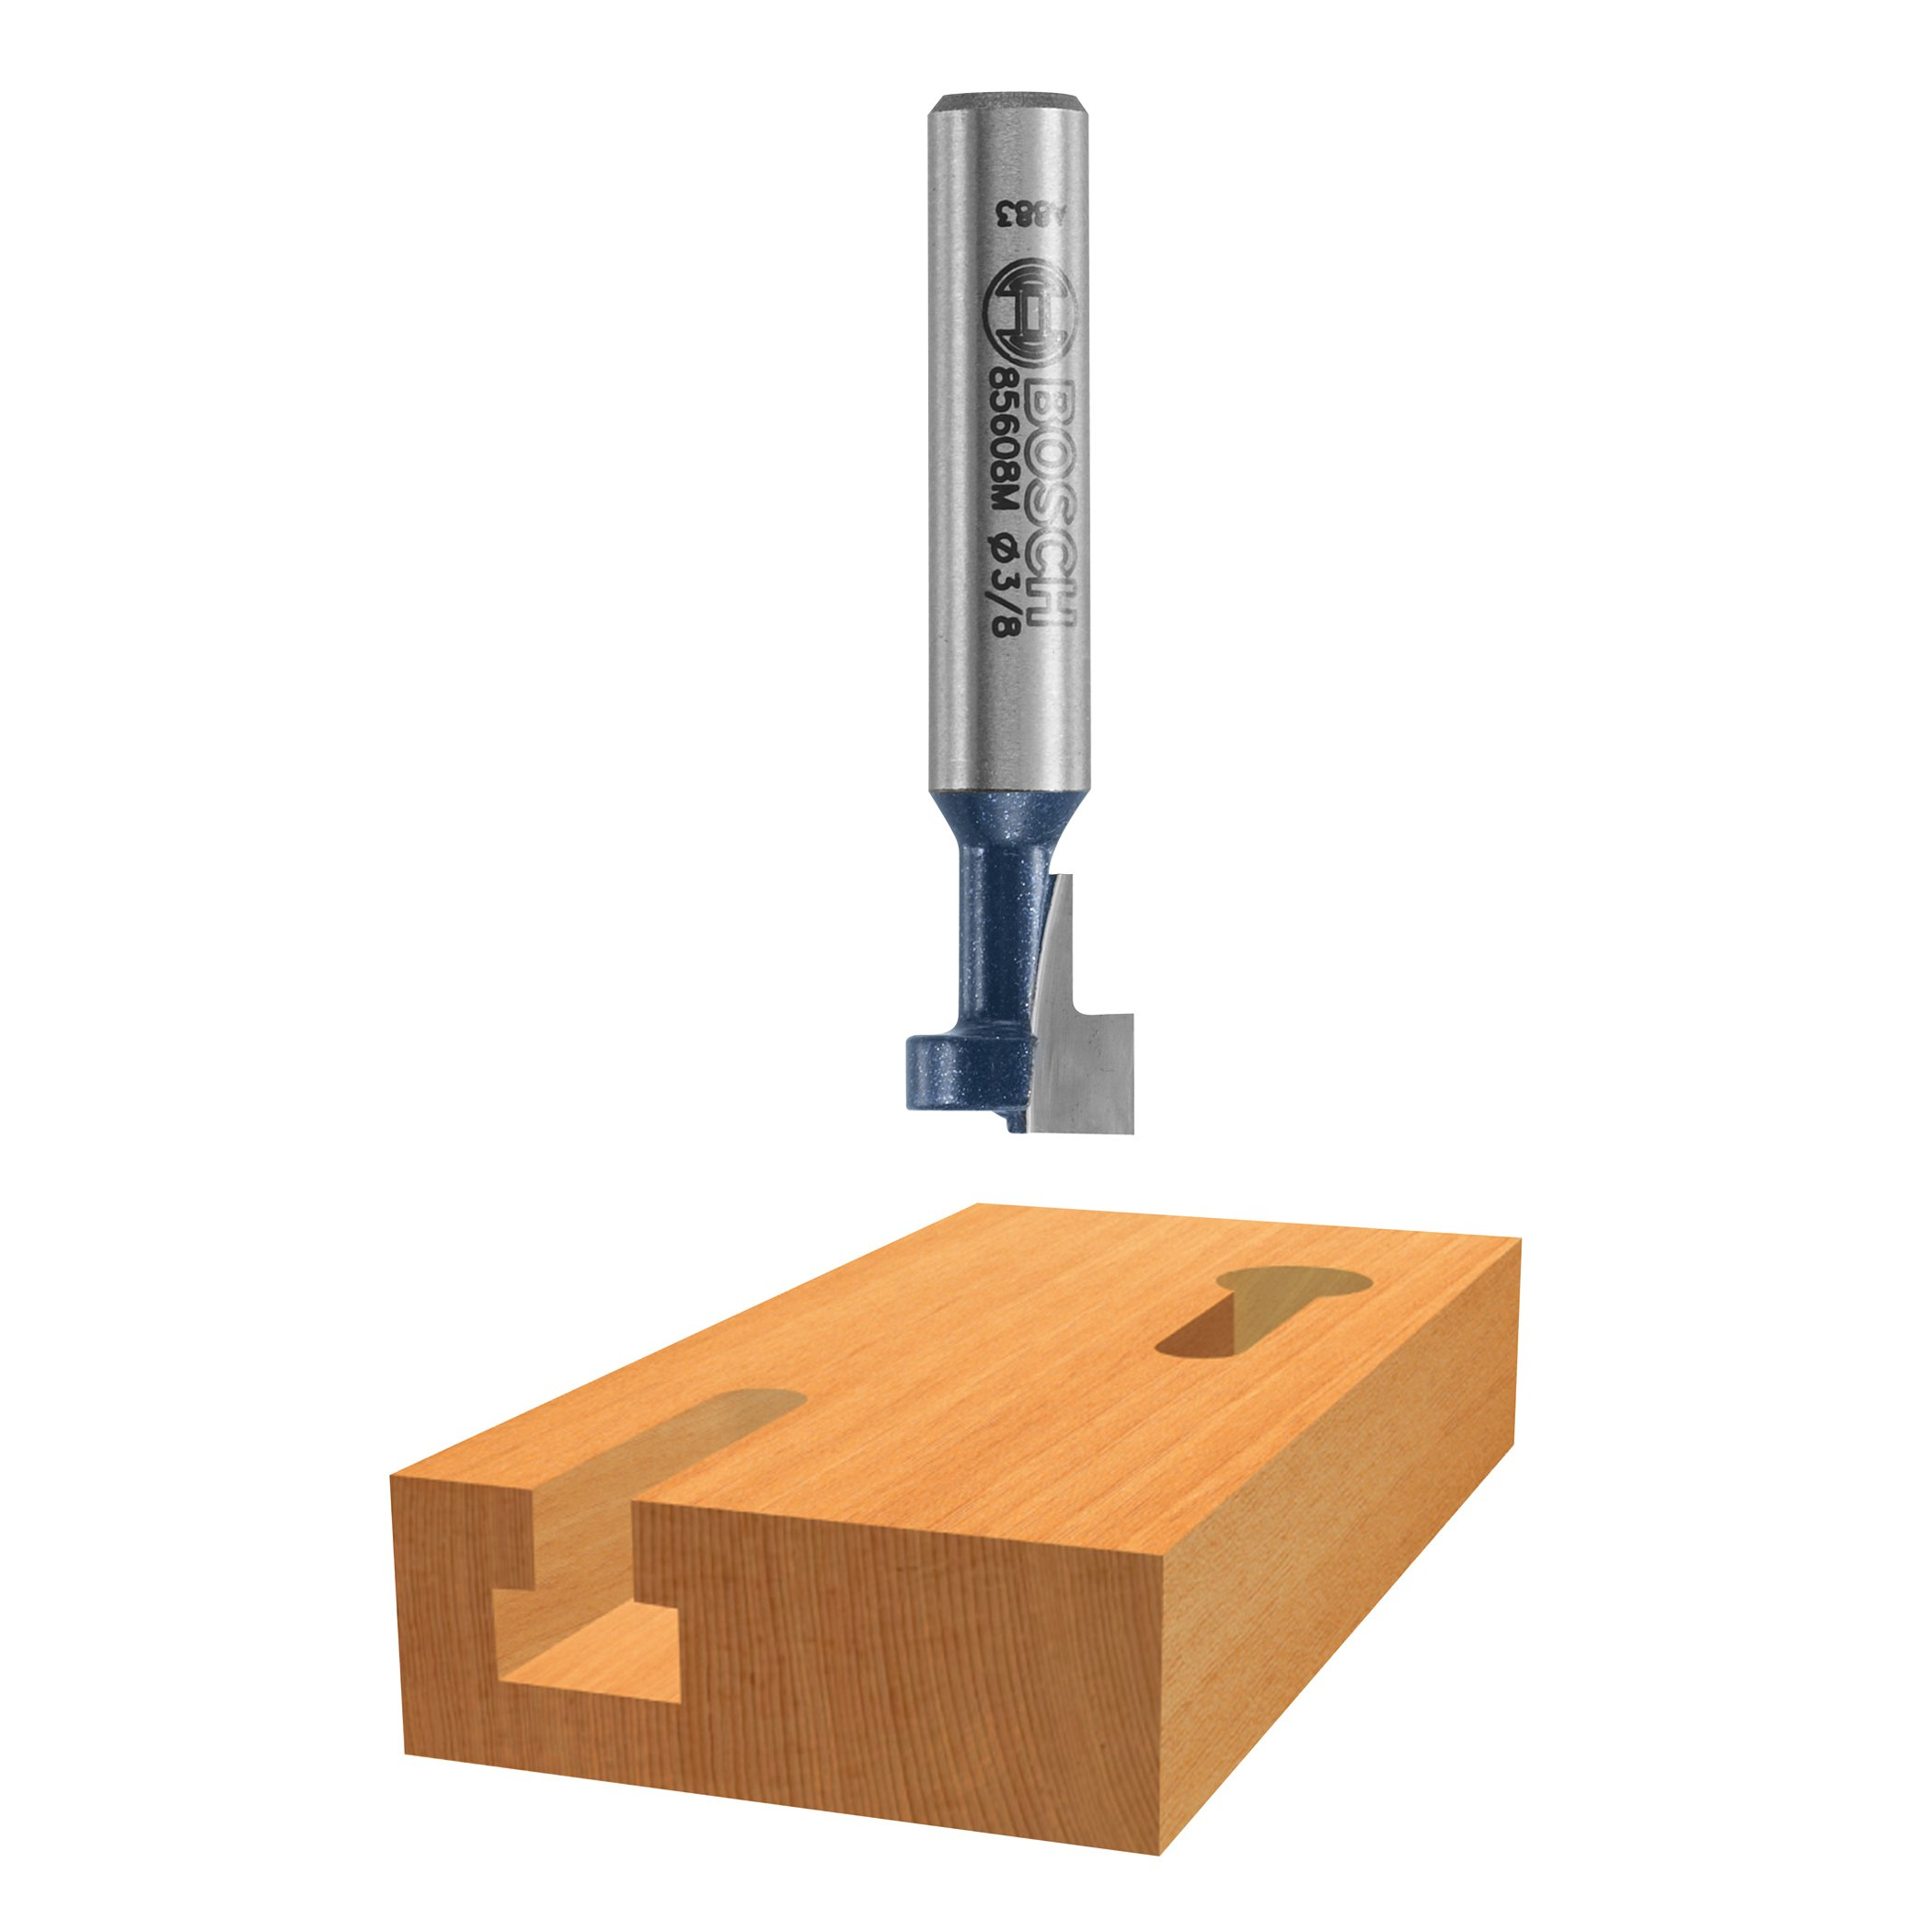 Bosch 85078 3/8 In. High Speed Steel Carbide-Tipped Keyhole Bit